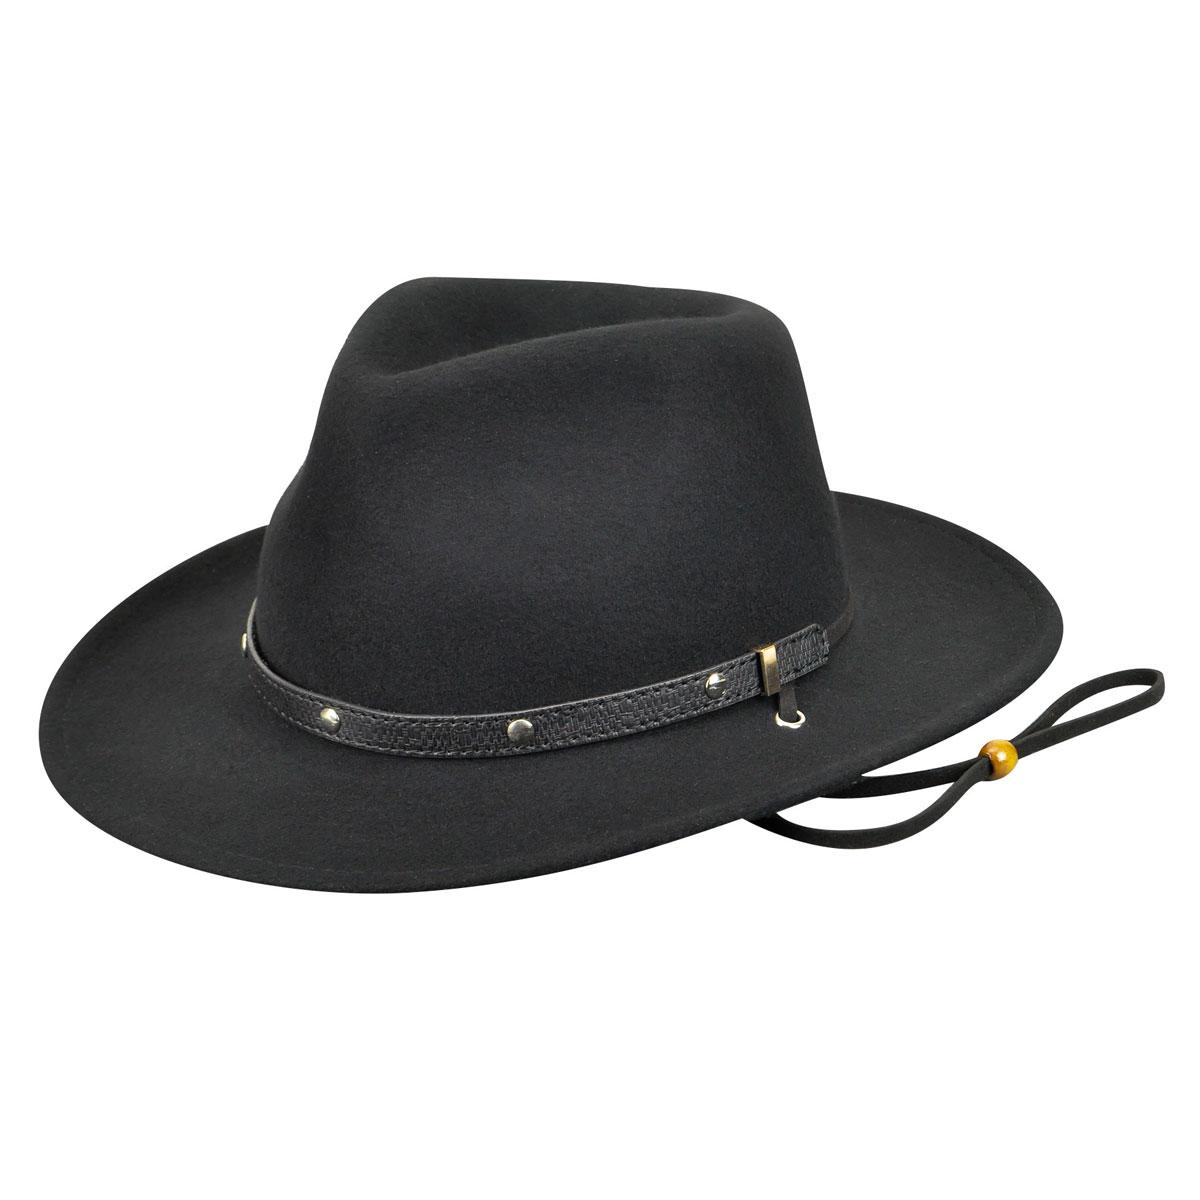 Eddy Bros. Calaboose Western Hat in Black